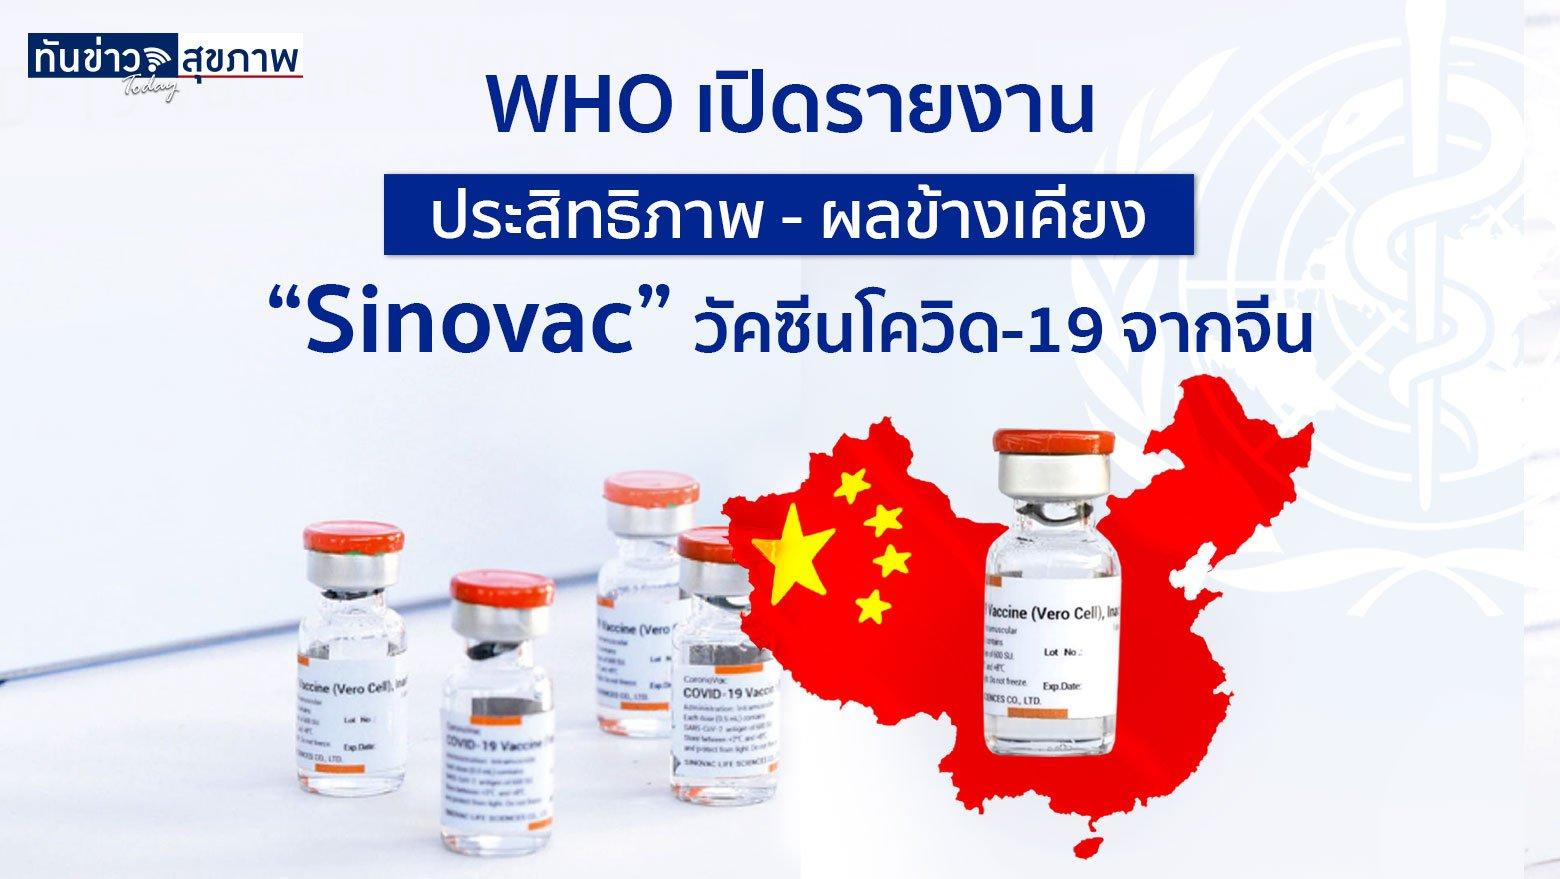 "WHO เปิดรายงานประสิทธิภาพ - ผลข้างเคียง ""Sinovac"" วัคซีนโควิด-19 จากจีน"